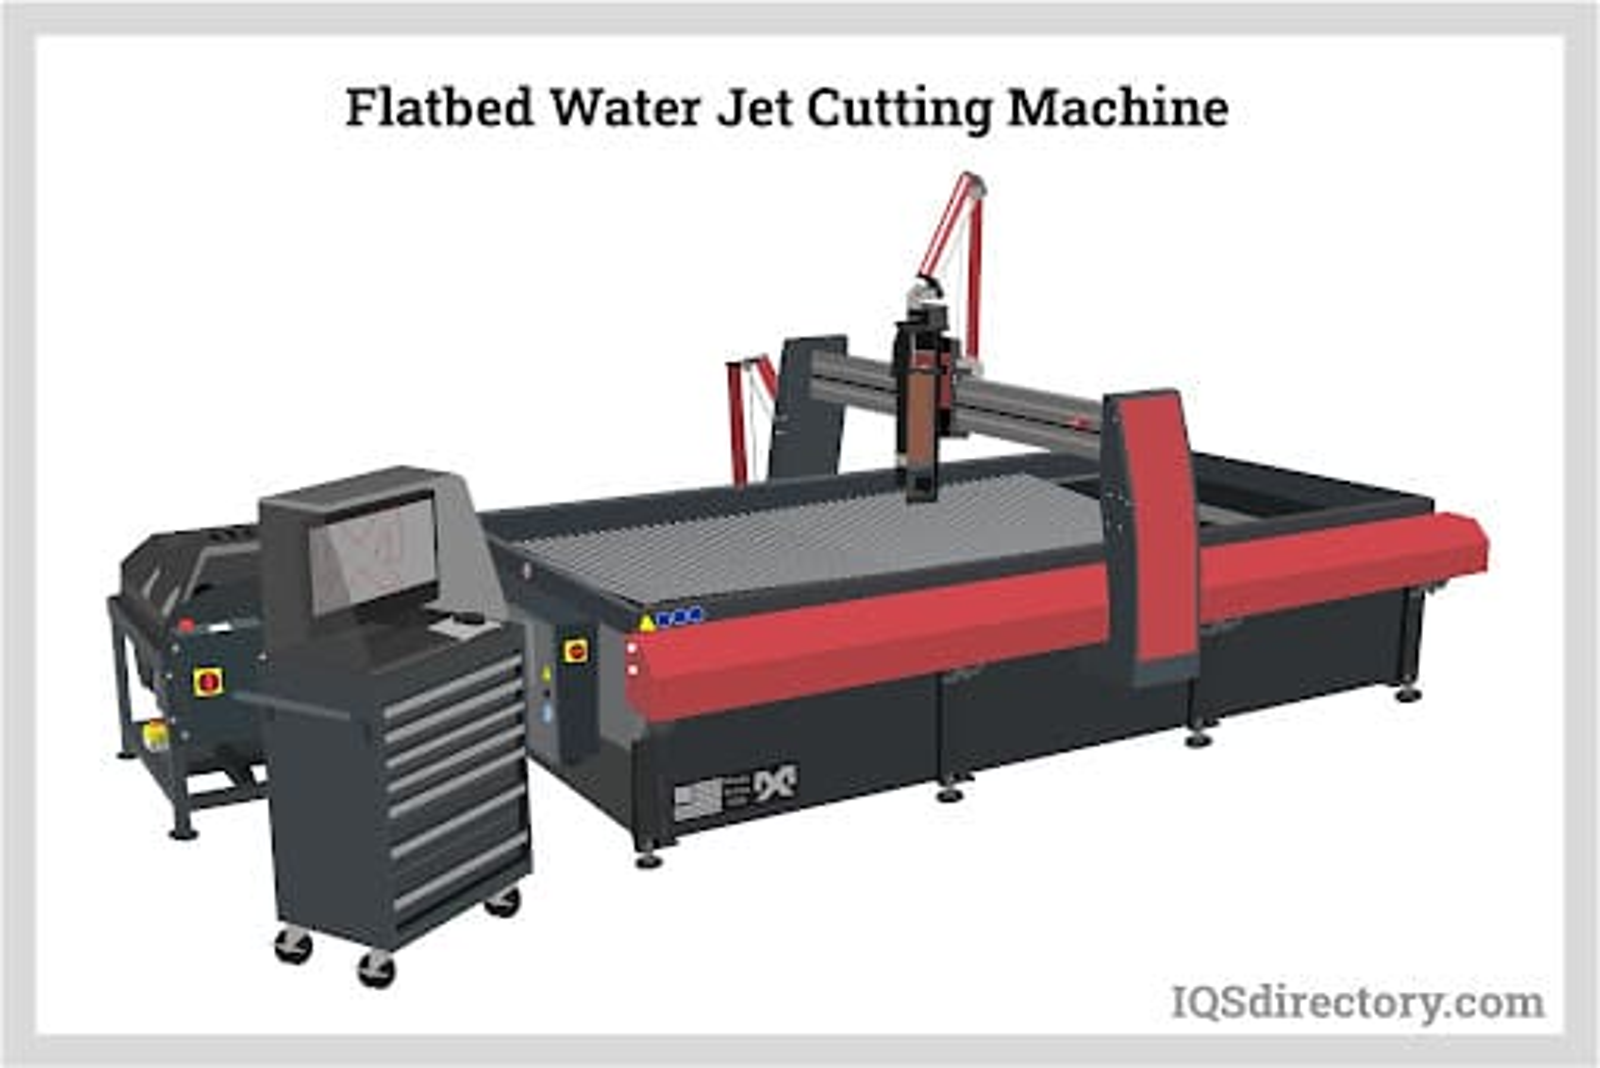 Flatbed Water Jet Cutting Machine